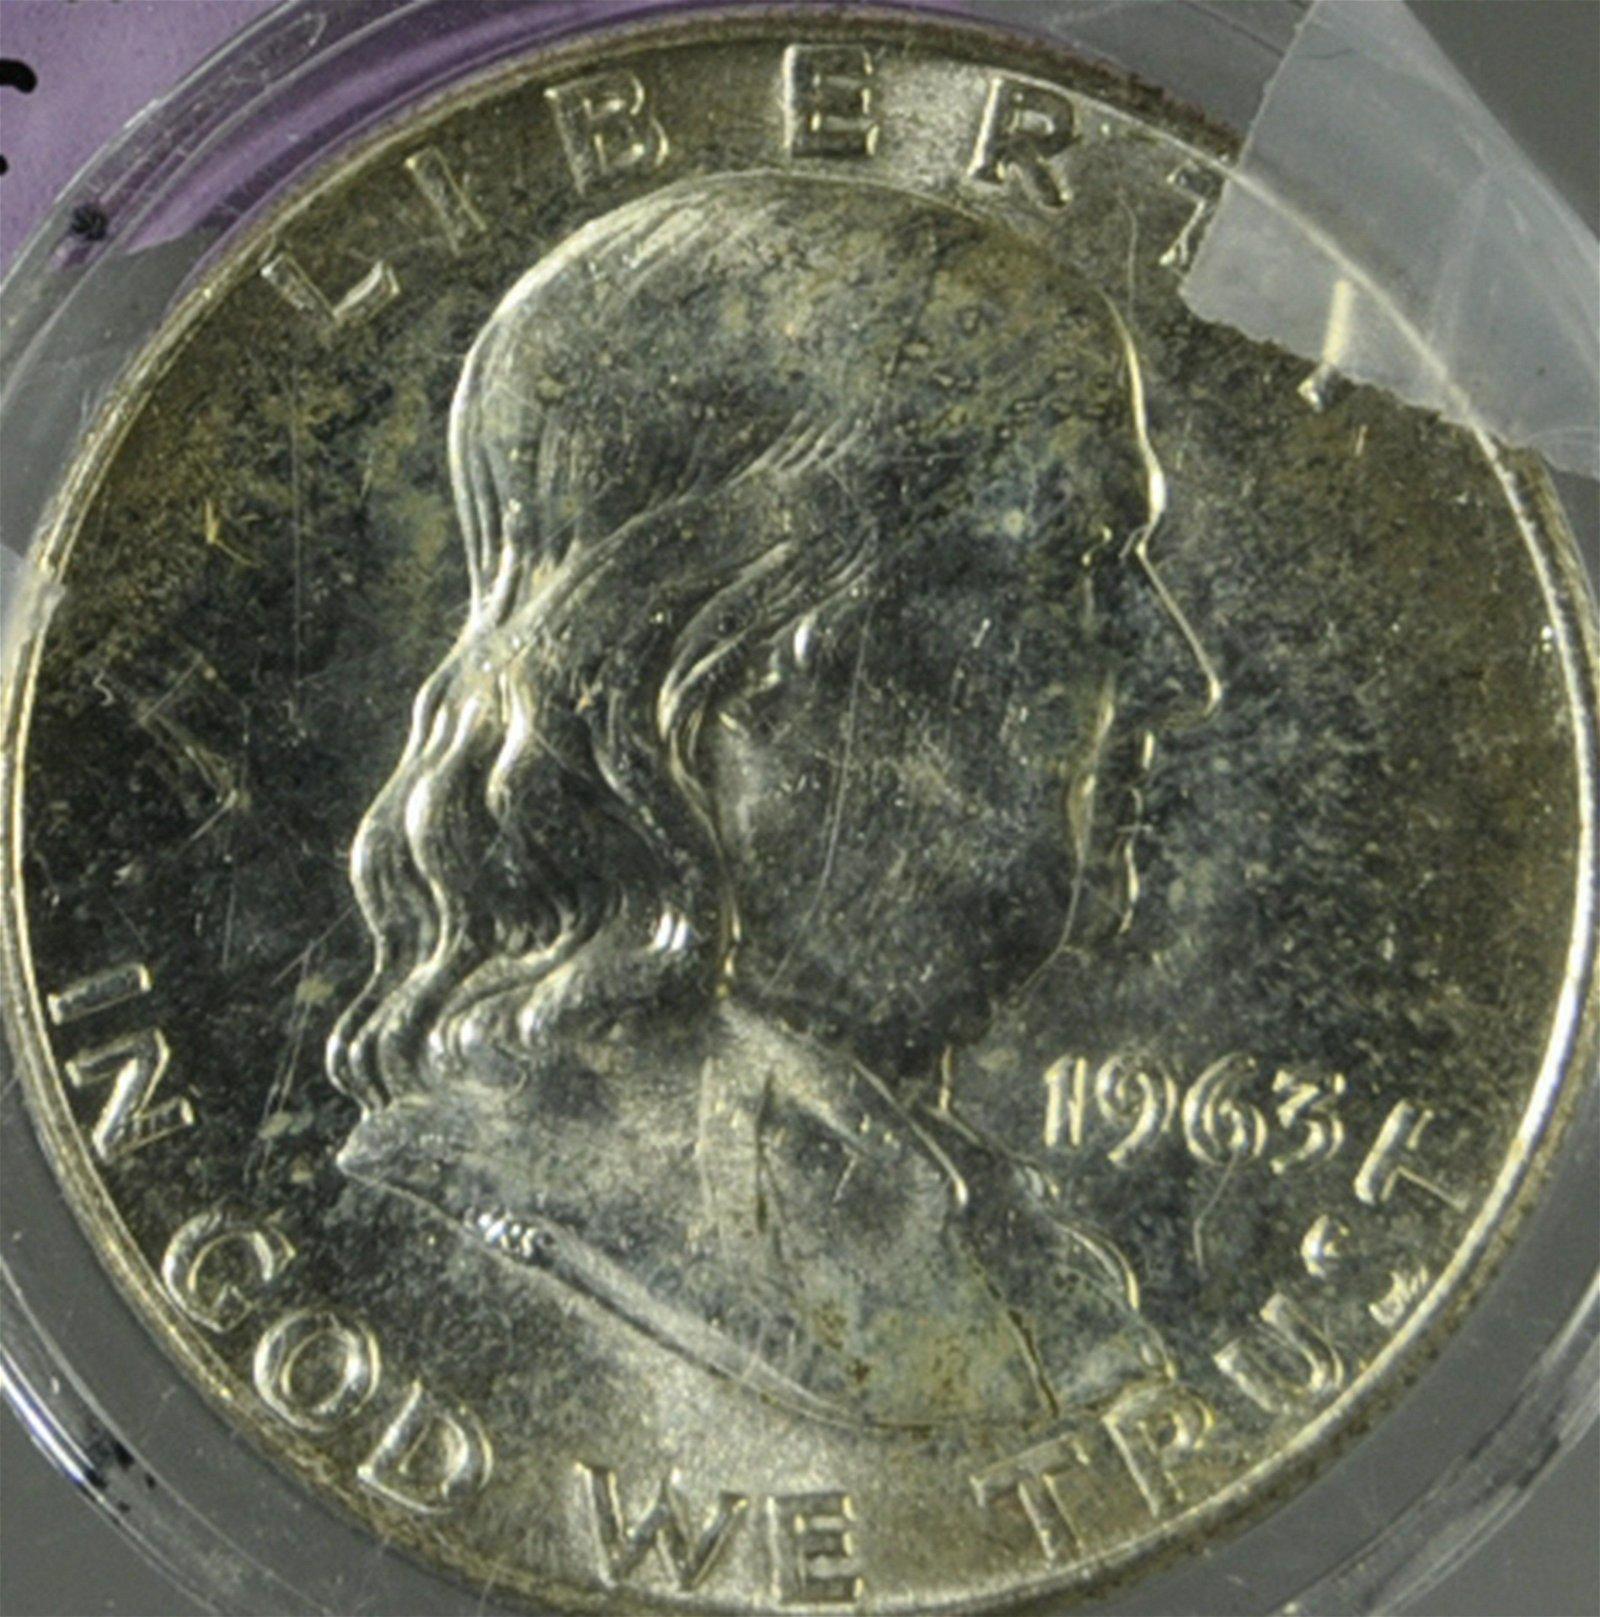 1963 D Franklin Silver Half